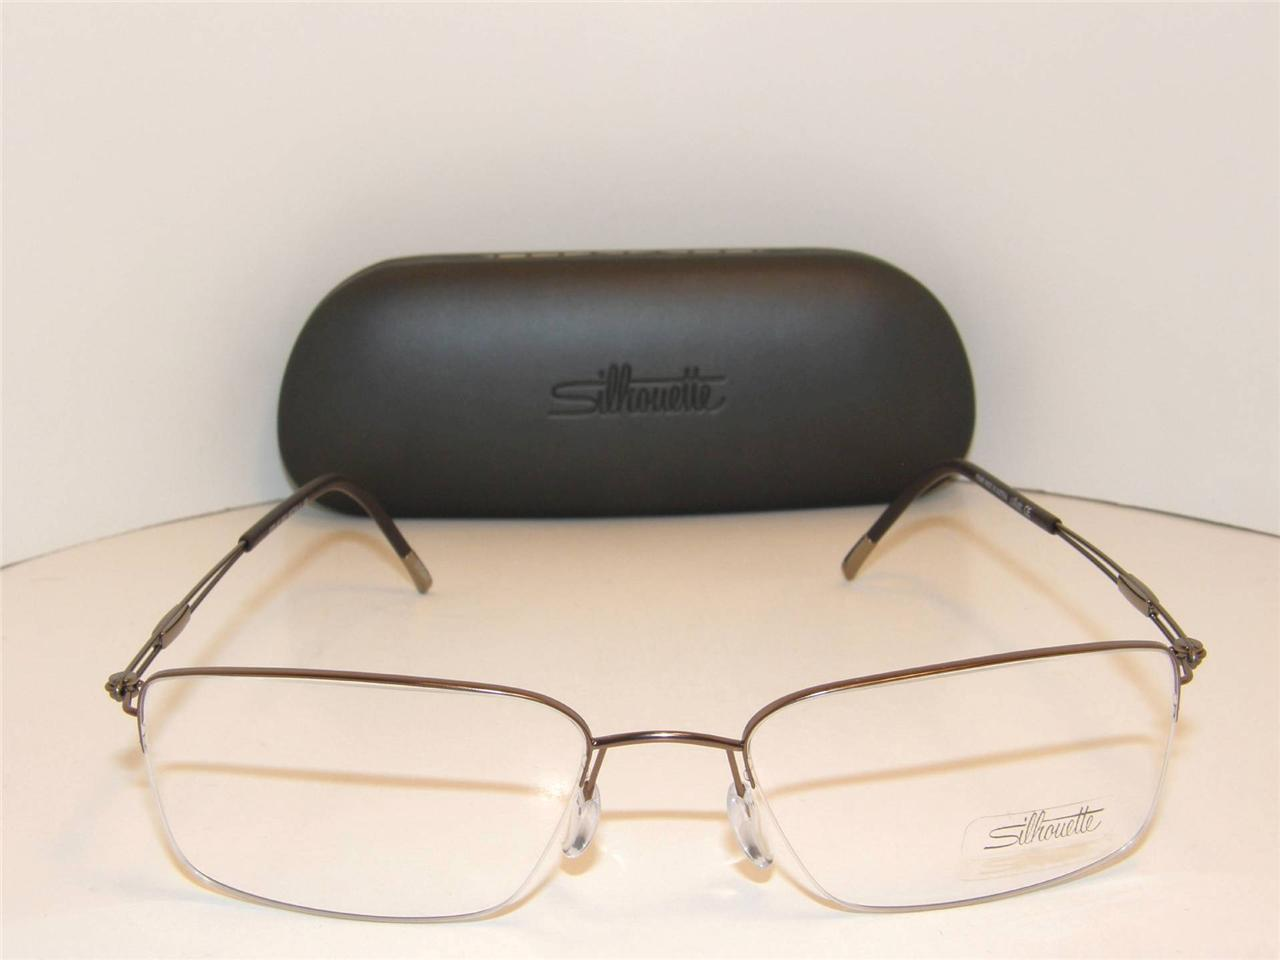 69e4f91945 New Authentic SIlhouette Titanium TITAN Eyeglasses SIL 5278 6052 55mm  Austria